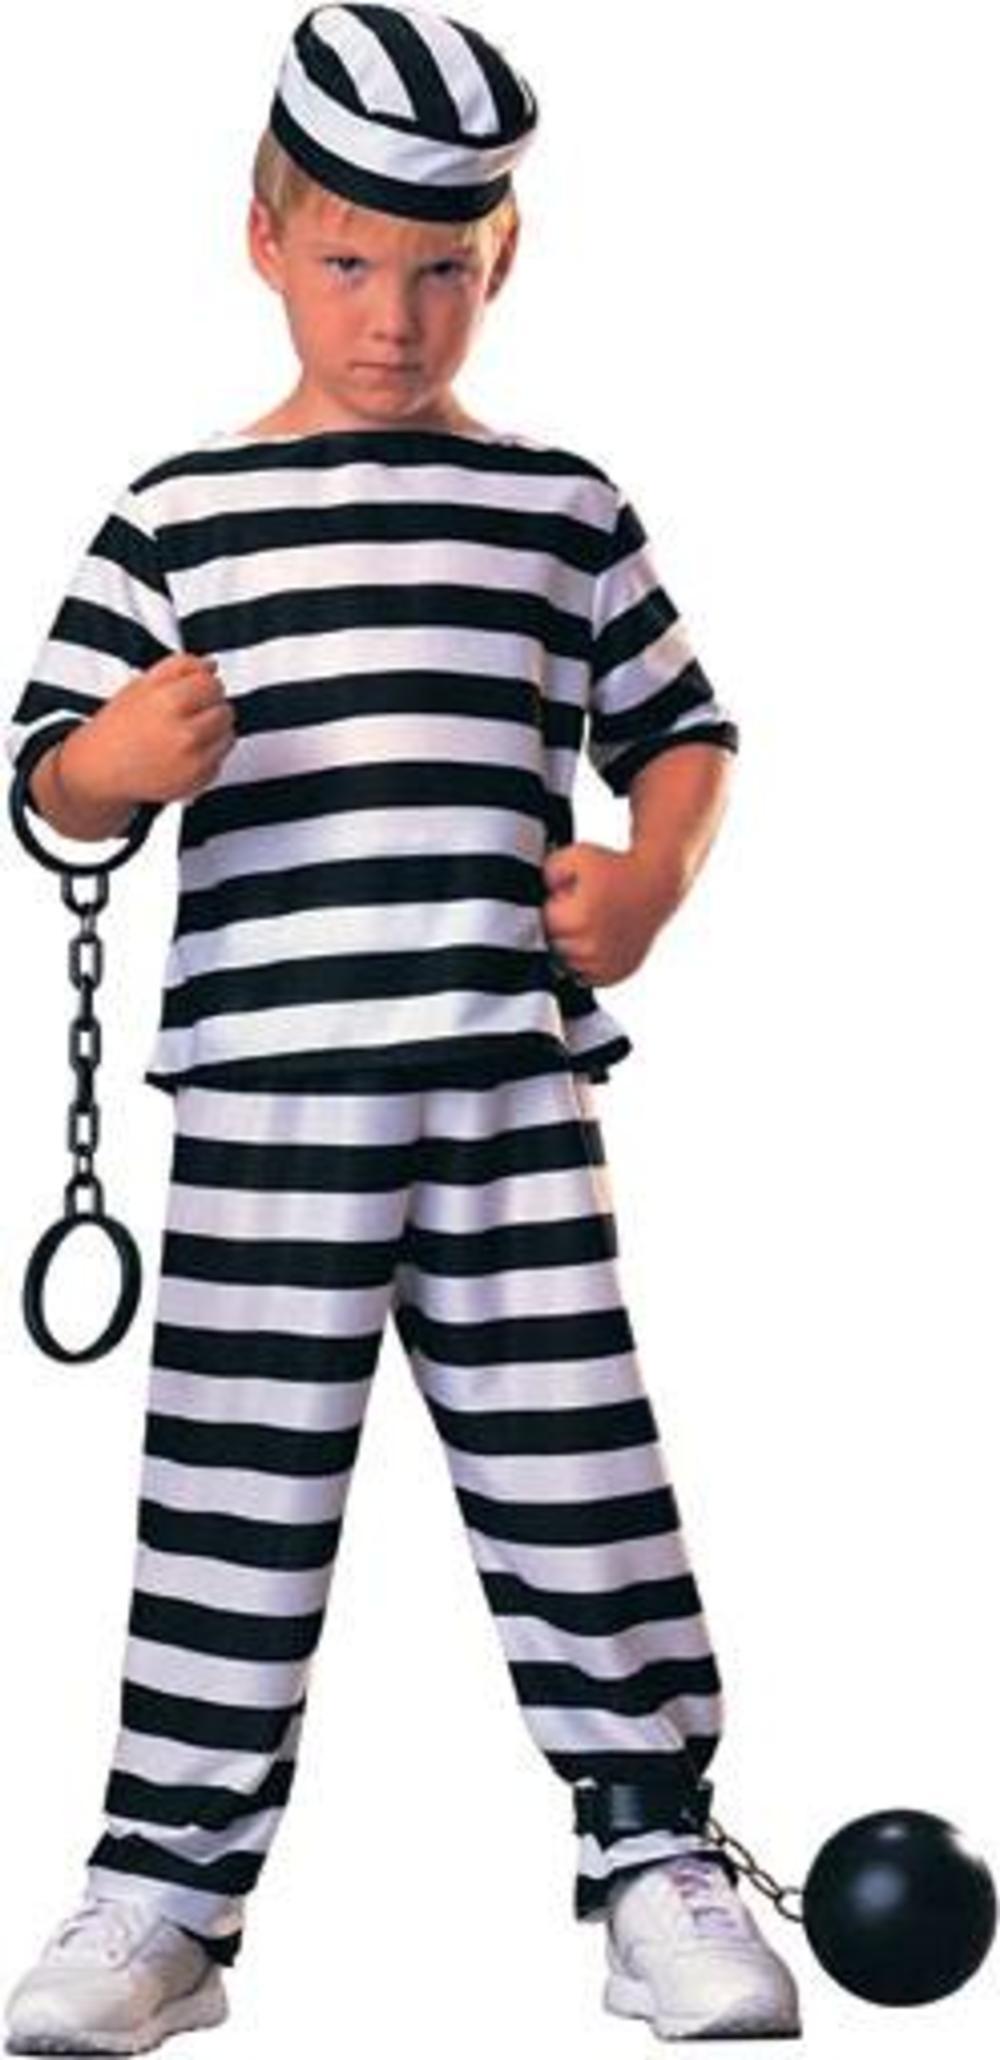 Prisoner Boy's Convict Fancy Dress Robber Uniform Kids Child Costume Ages 3-10 Y